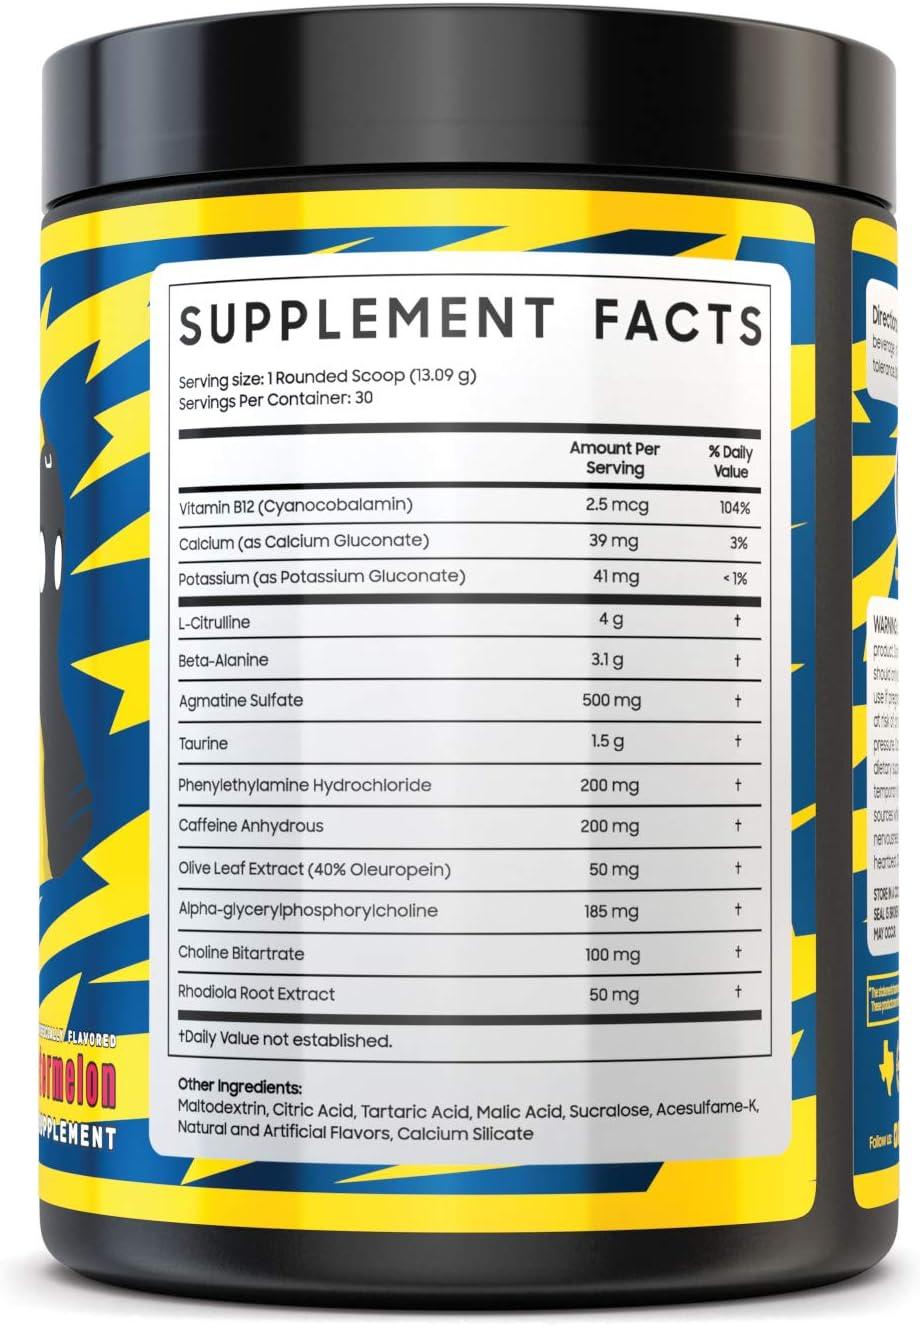 Myth Journey Pre Workout Powder – Energy Supplement Preworkout for Men Women – Caffeine, Alpha GPC, L-Citrulline, Beta-Alanine – Electric Watermelon, 30 Servings 2019 Formula